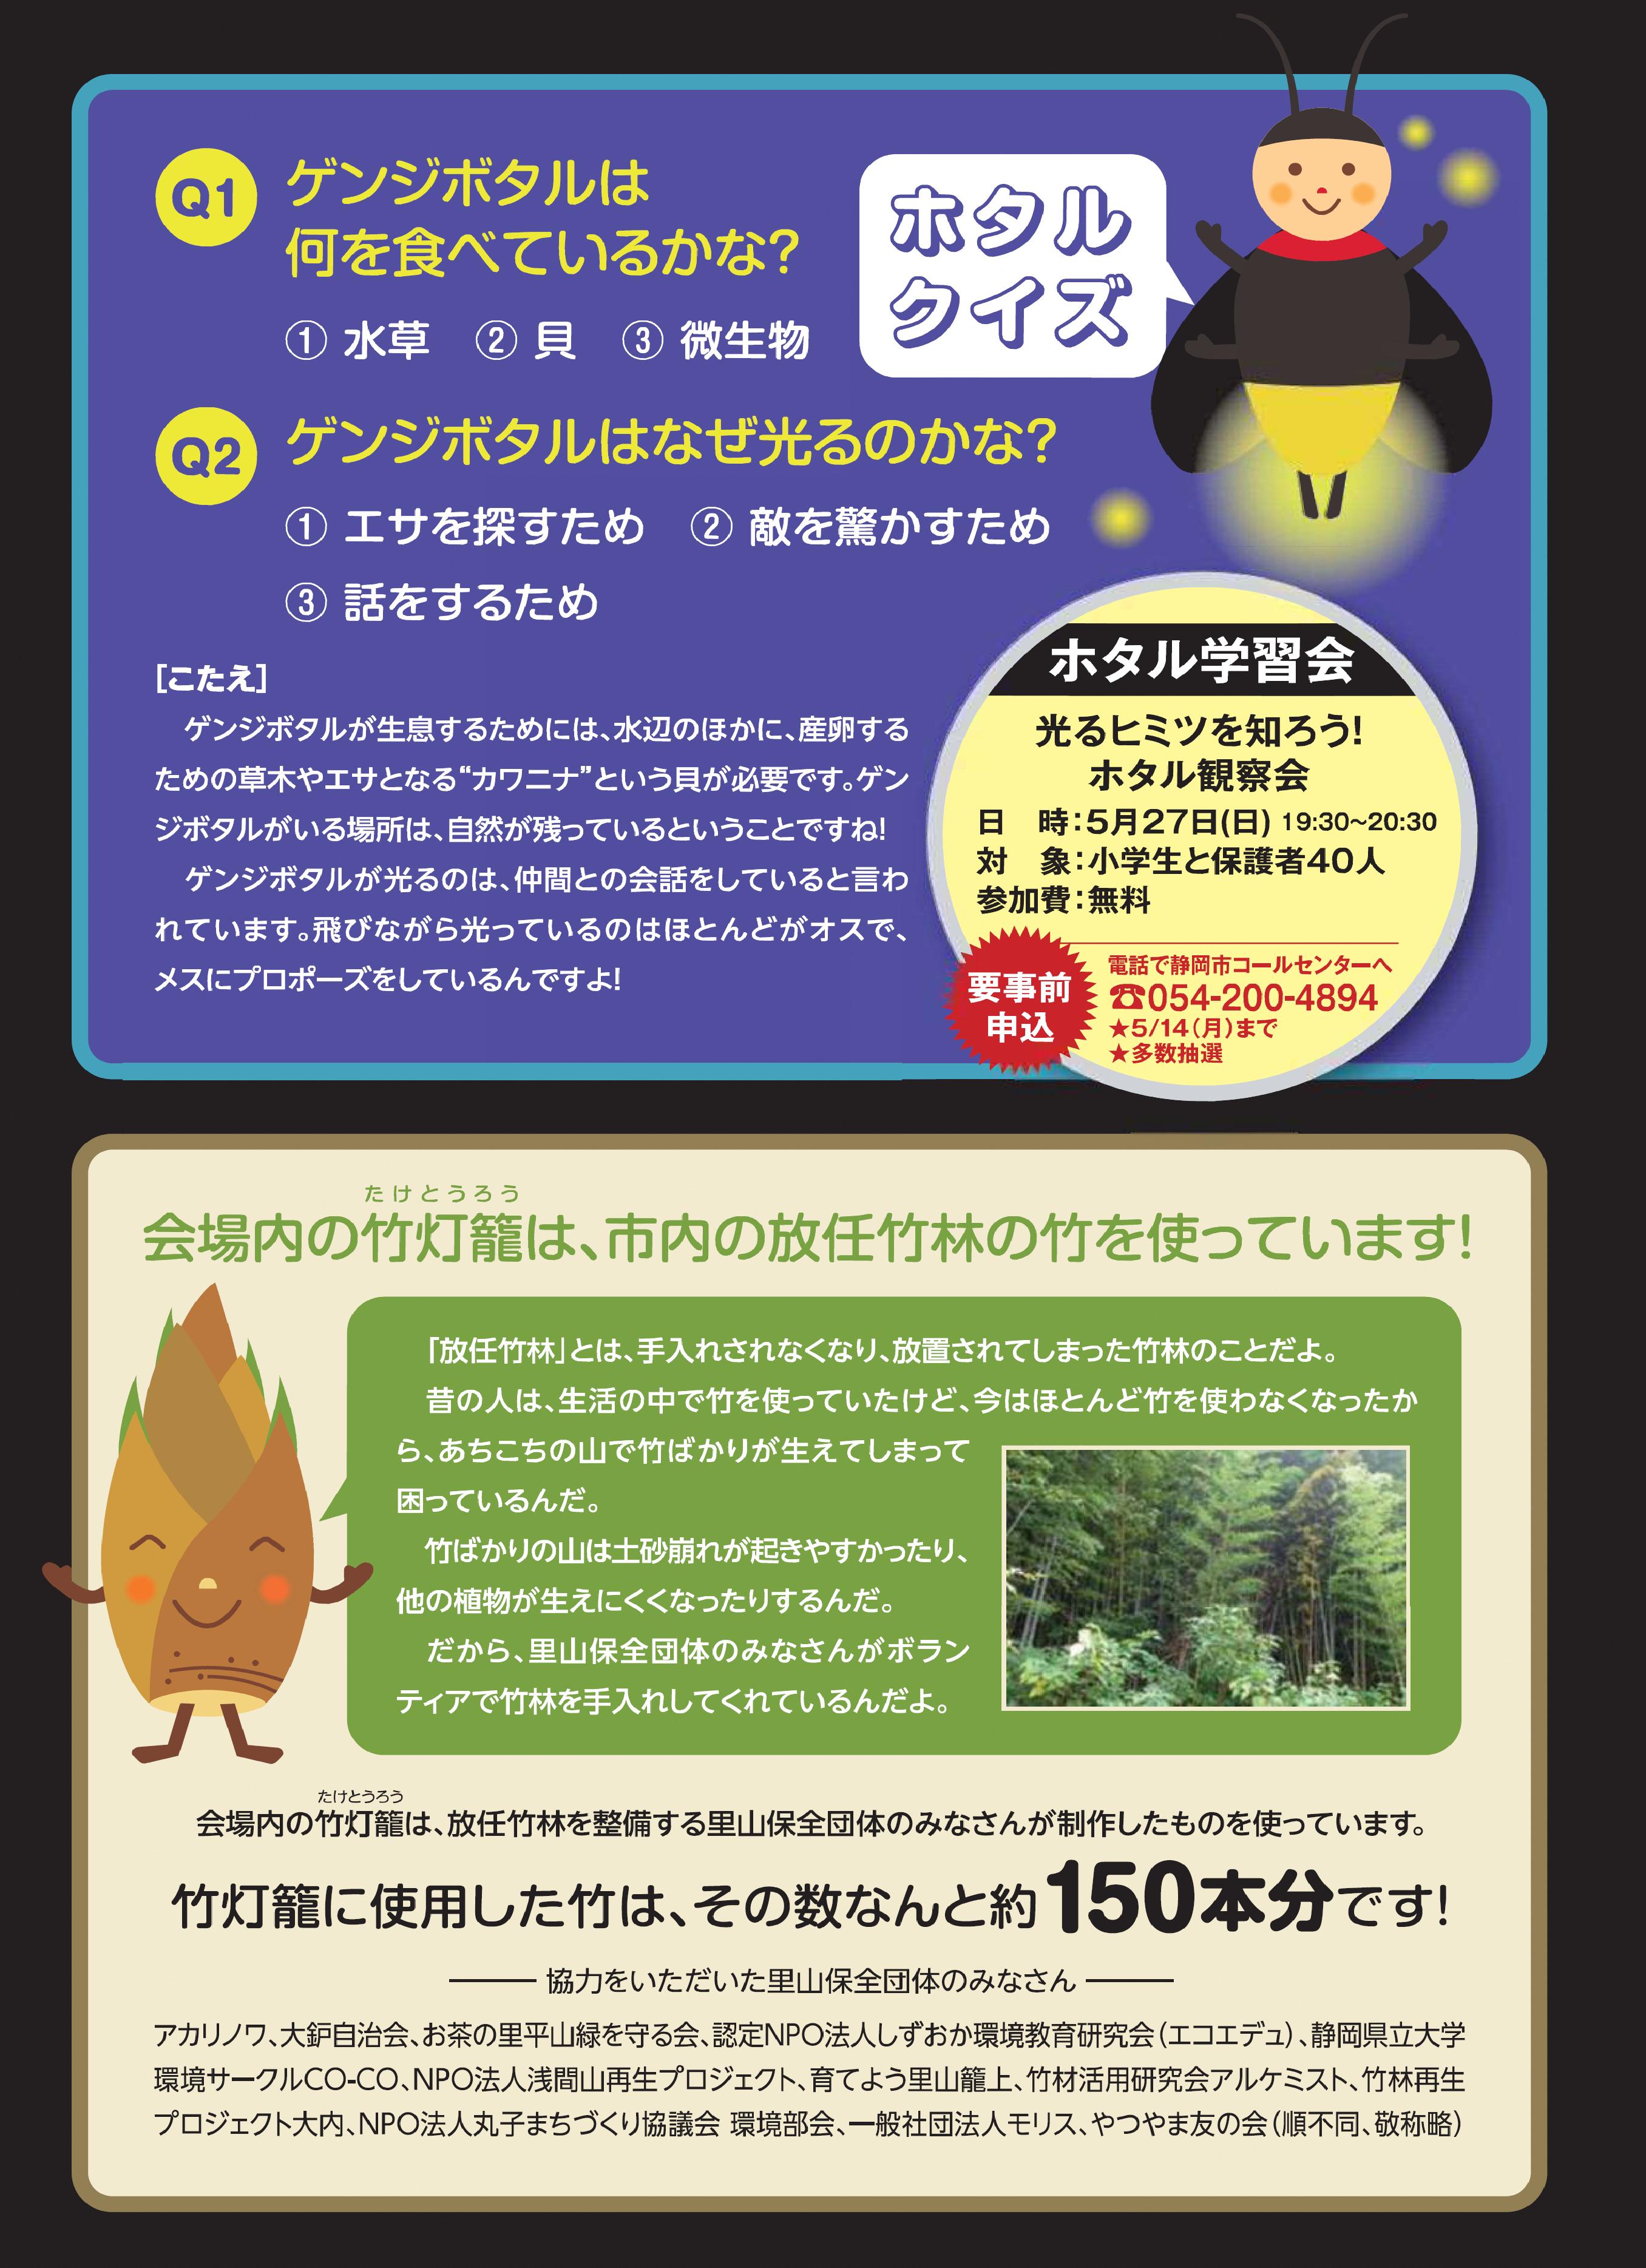 http://www.shizutan.jp/learning/2018/05/08/images/%E7%84%A1%E9%A1%8C%E2%91%A1.png